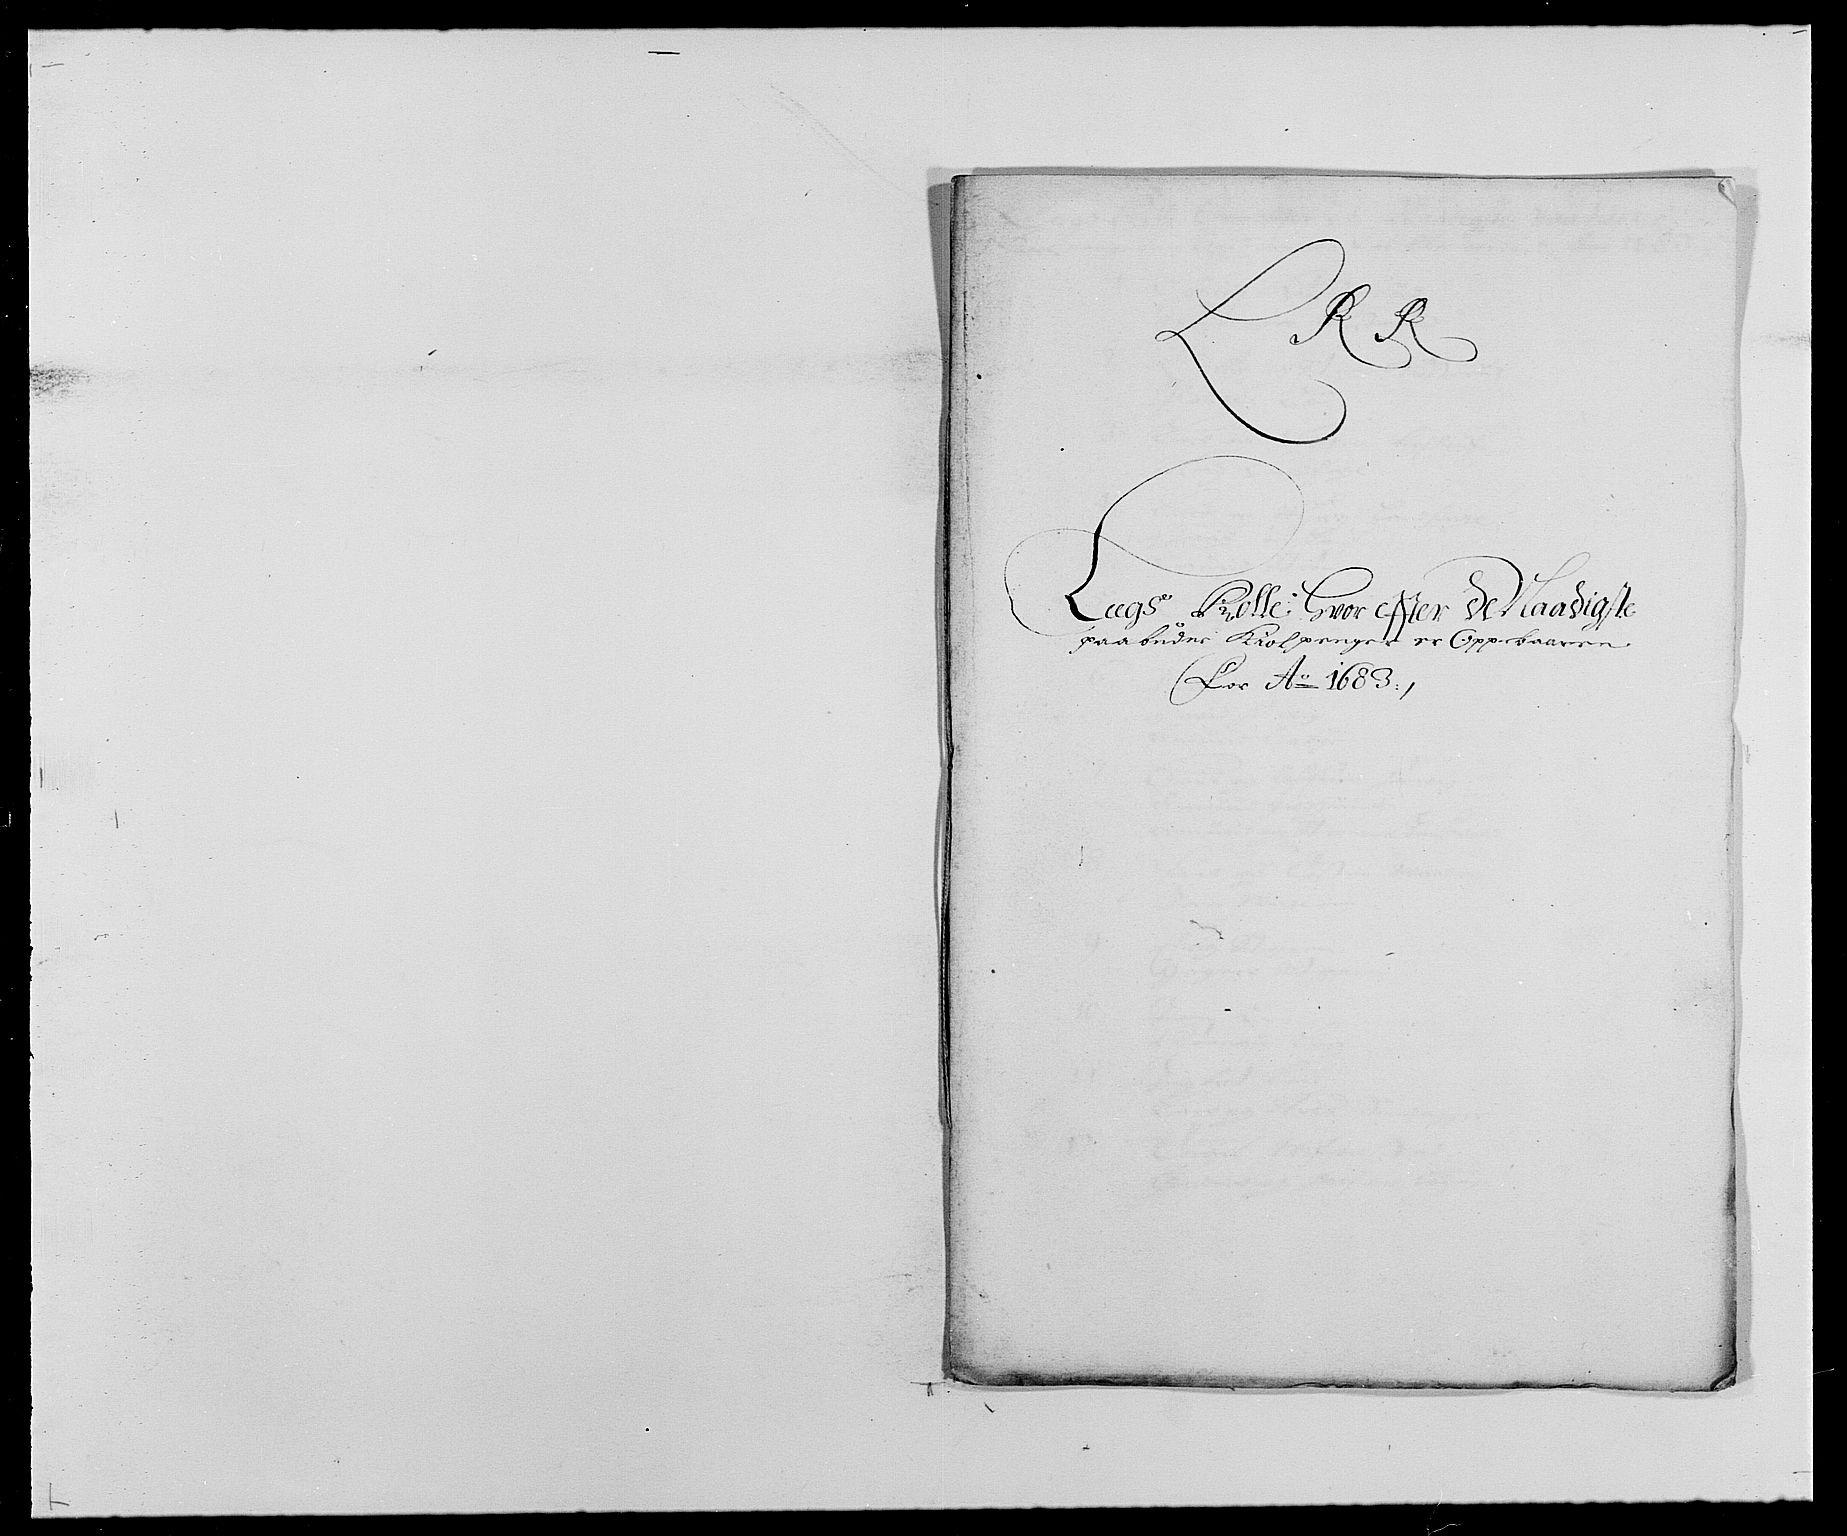 RA, Rentekammeret inntil 1814, Reviderte regnskaper, Fogderegnskap, R27/L1687: Fogderegnskap Lier, 1678-1686, s. 32